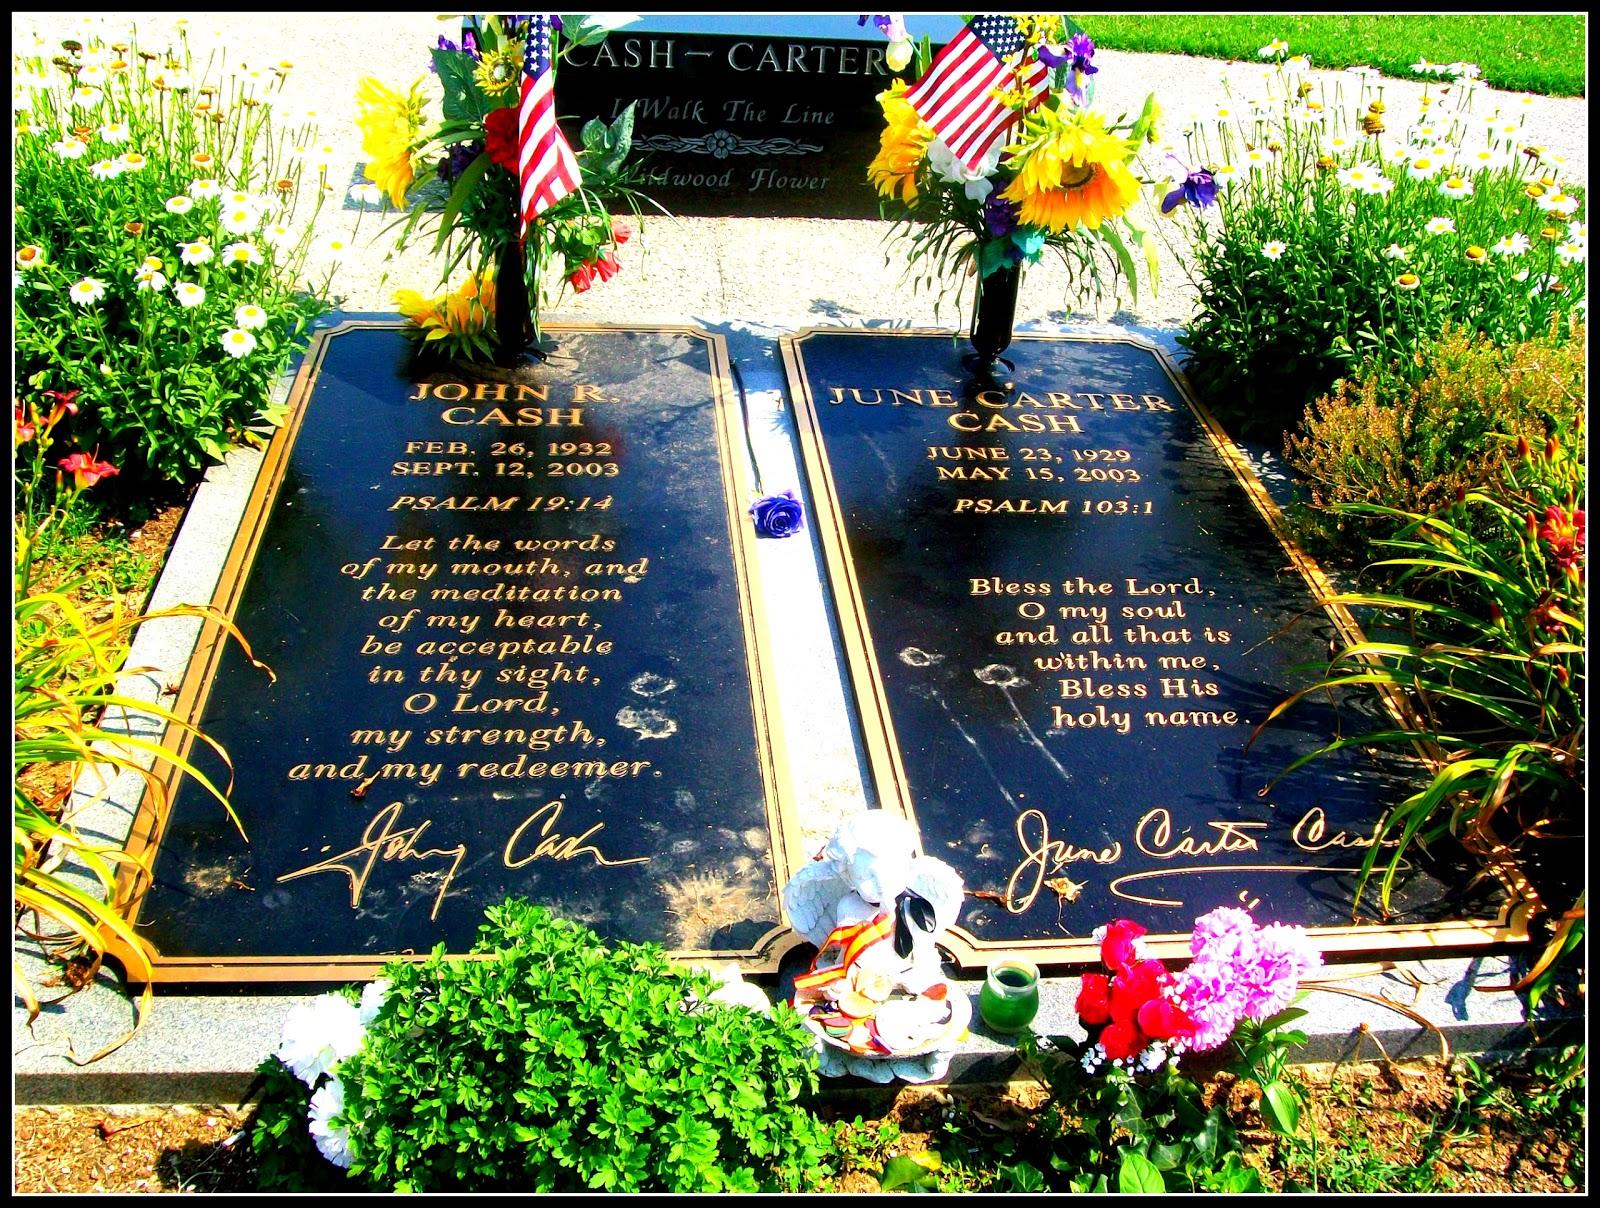 Johnny Cash Amp June Carter Grave Stones